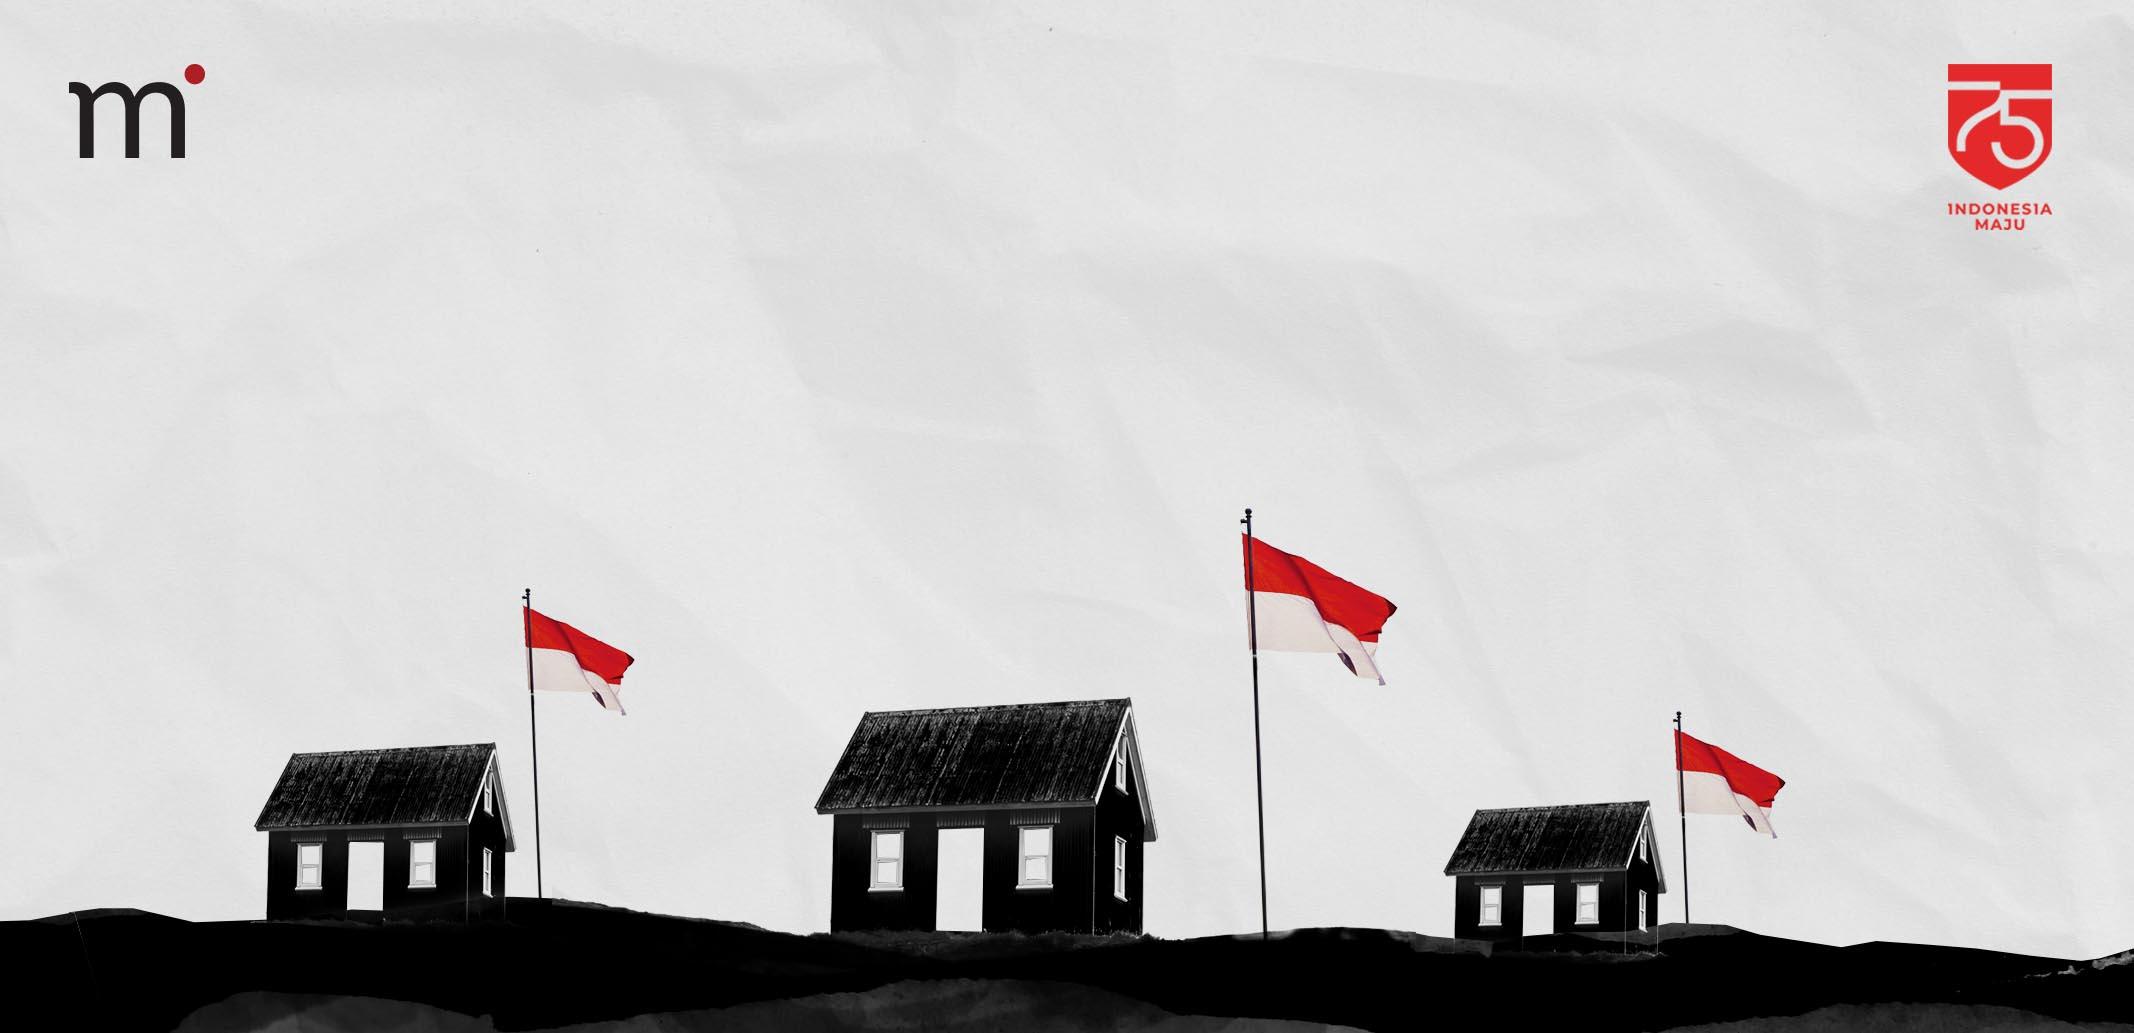 Bersama Kita Rayakan Kemerdekaan Indonesia